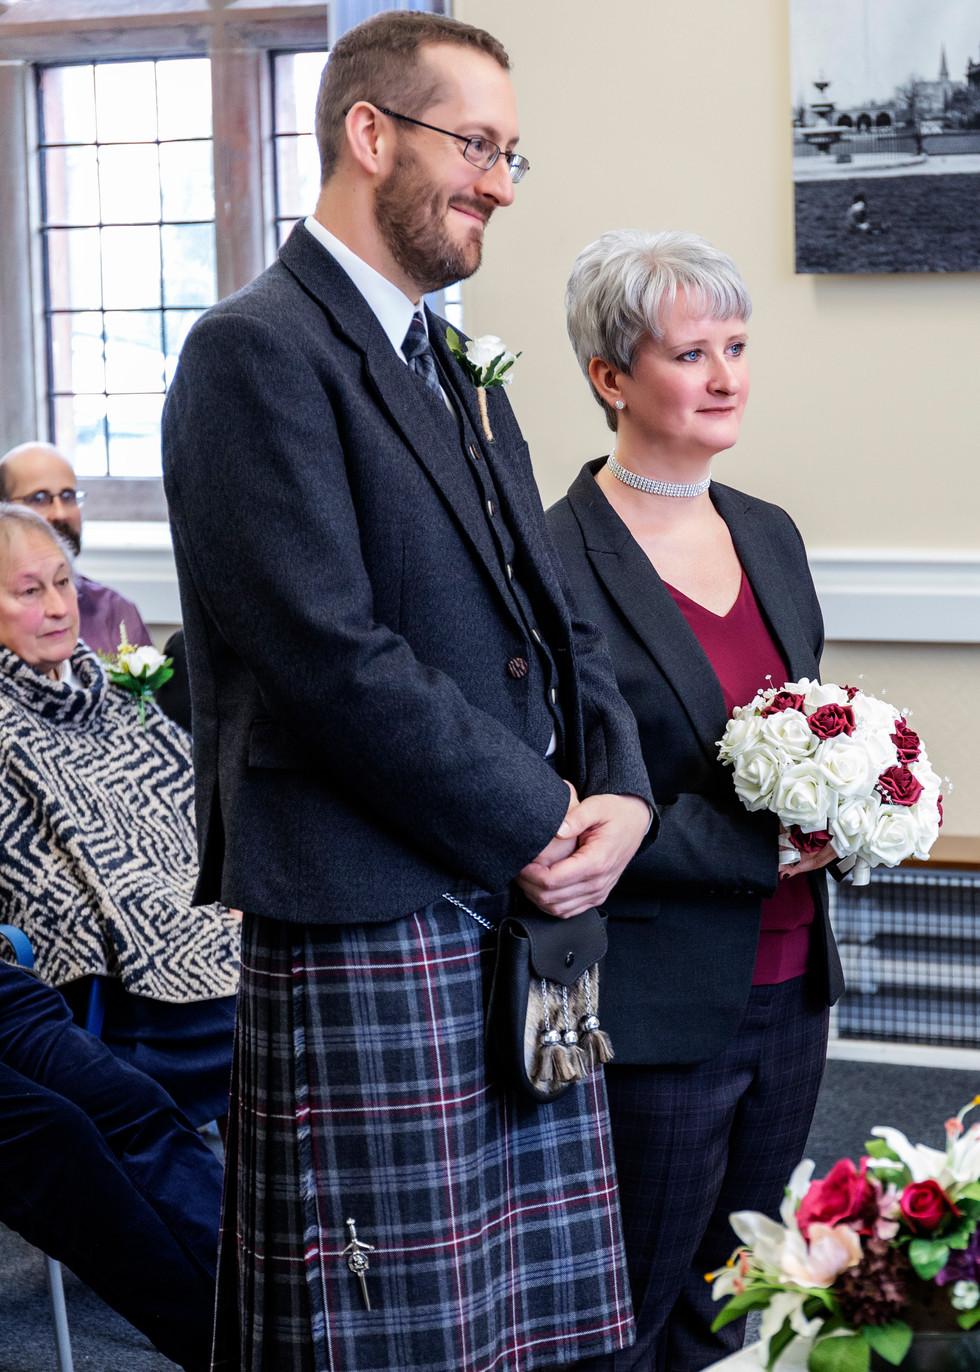 Wedding final edit (3).jpg